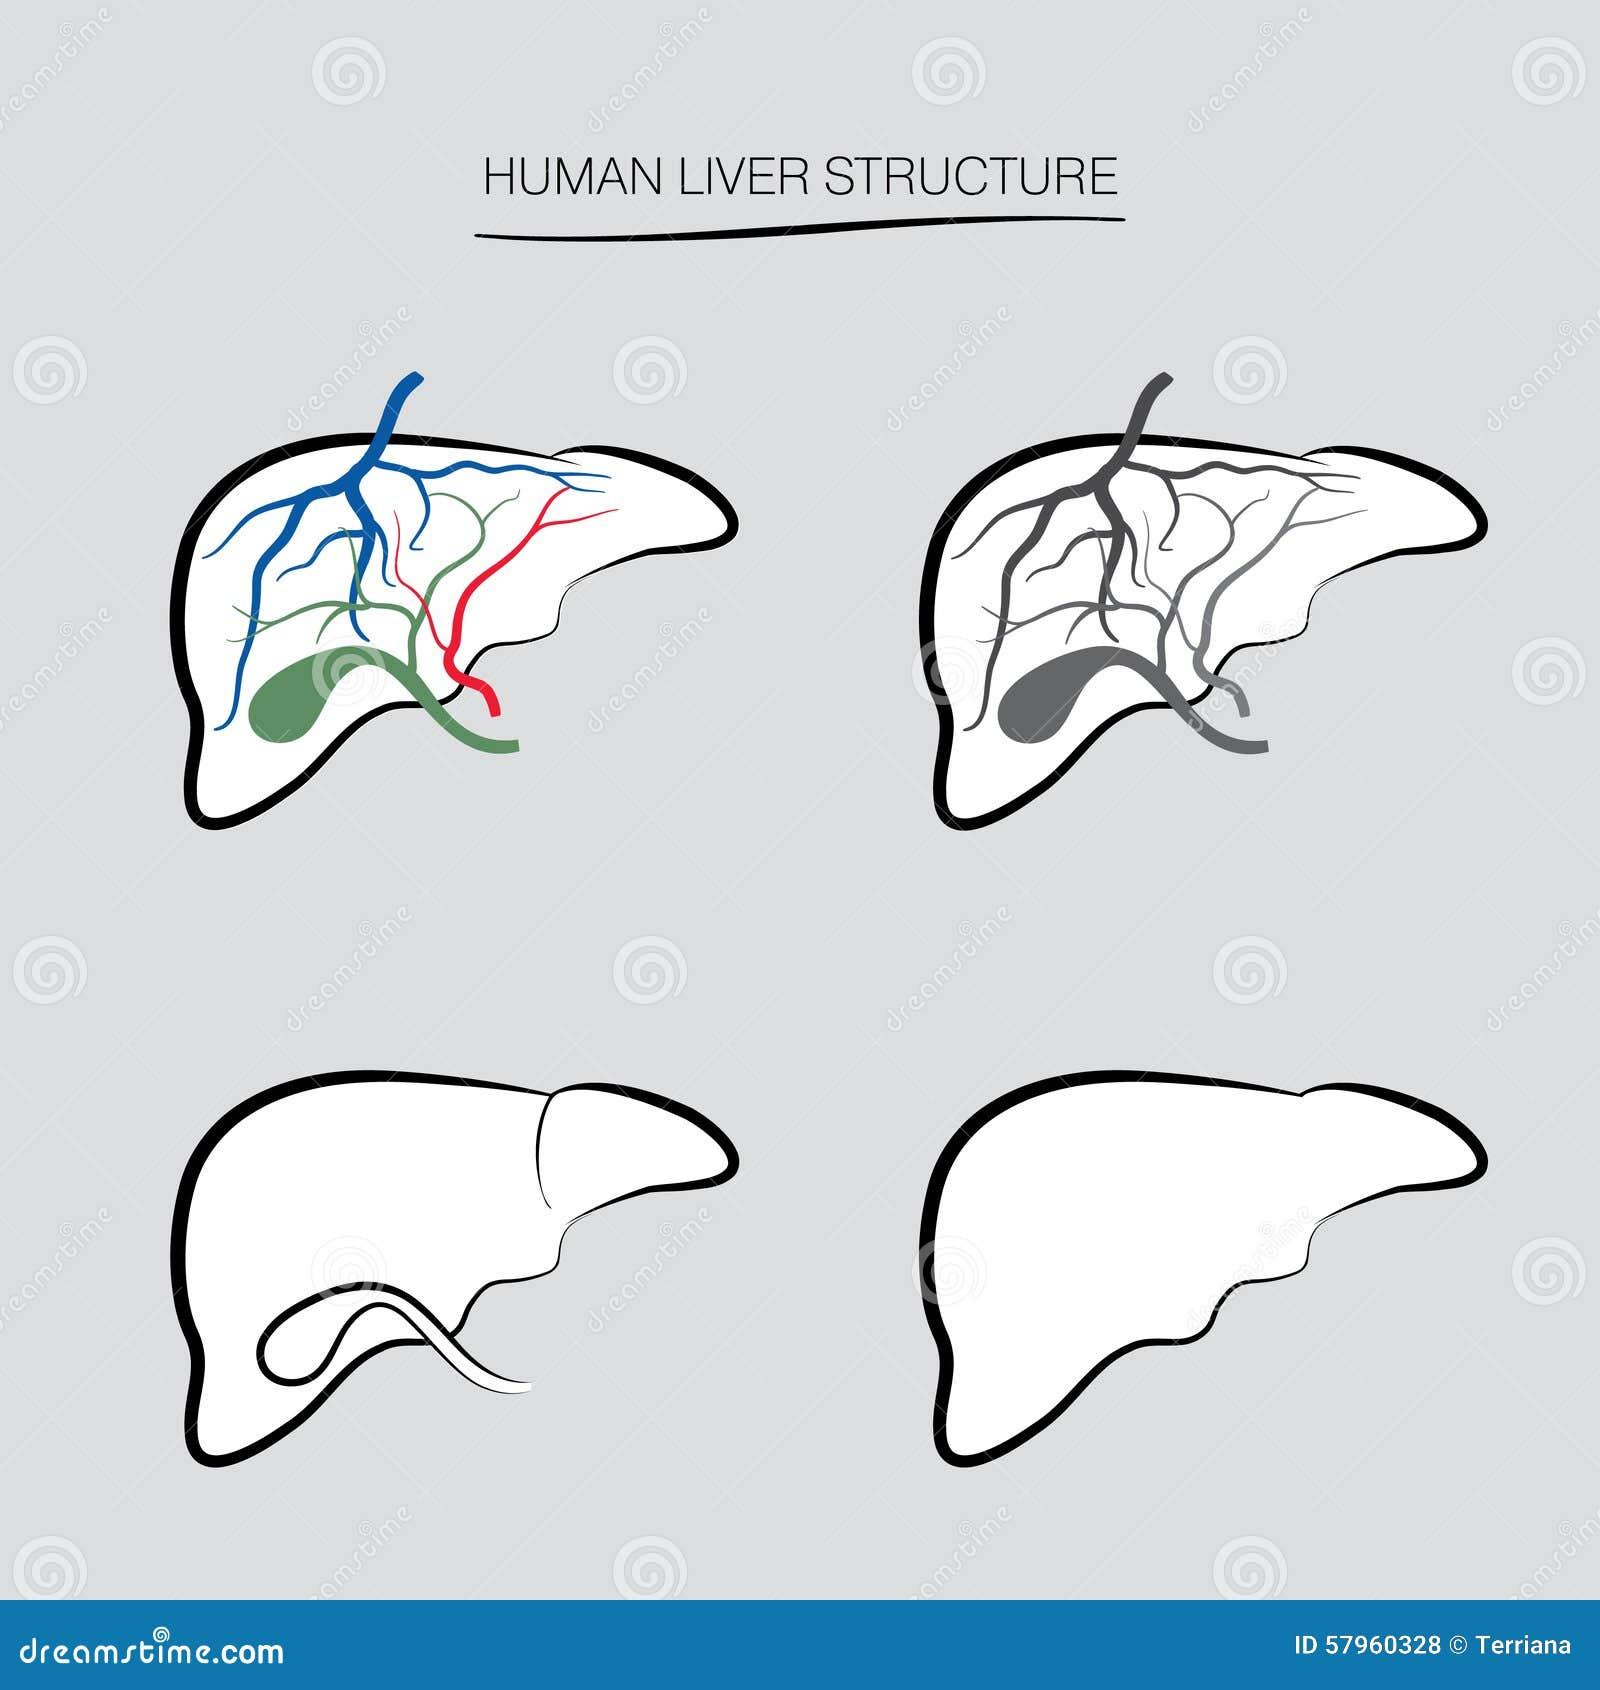 Human Liver Anatomy Human Internal Organ Icons Stock Illustration